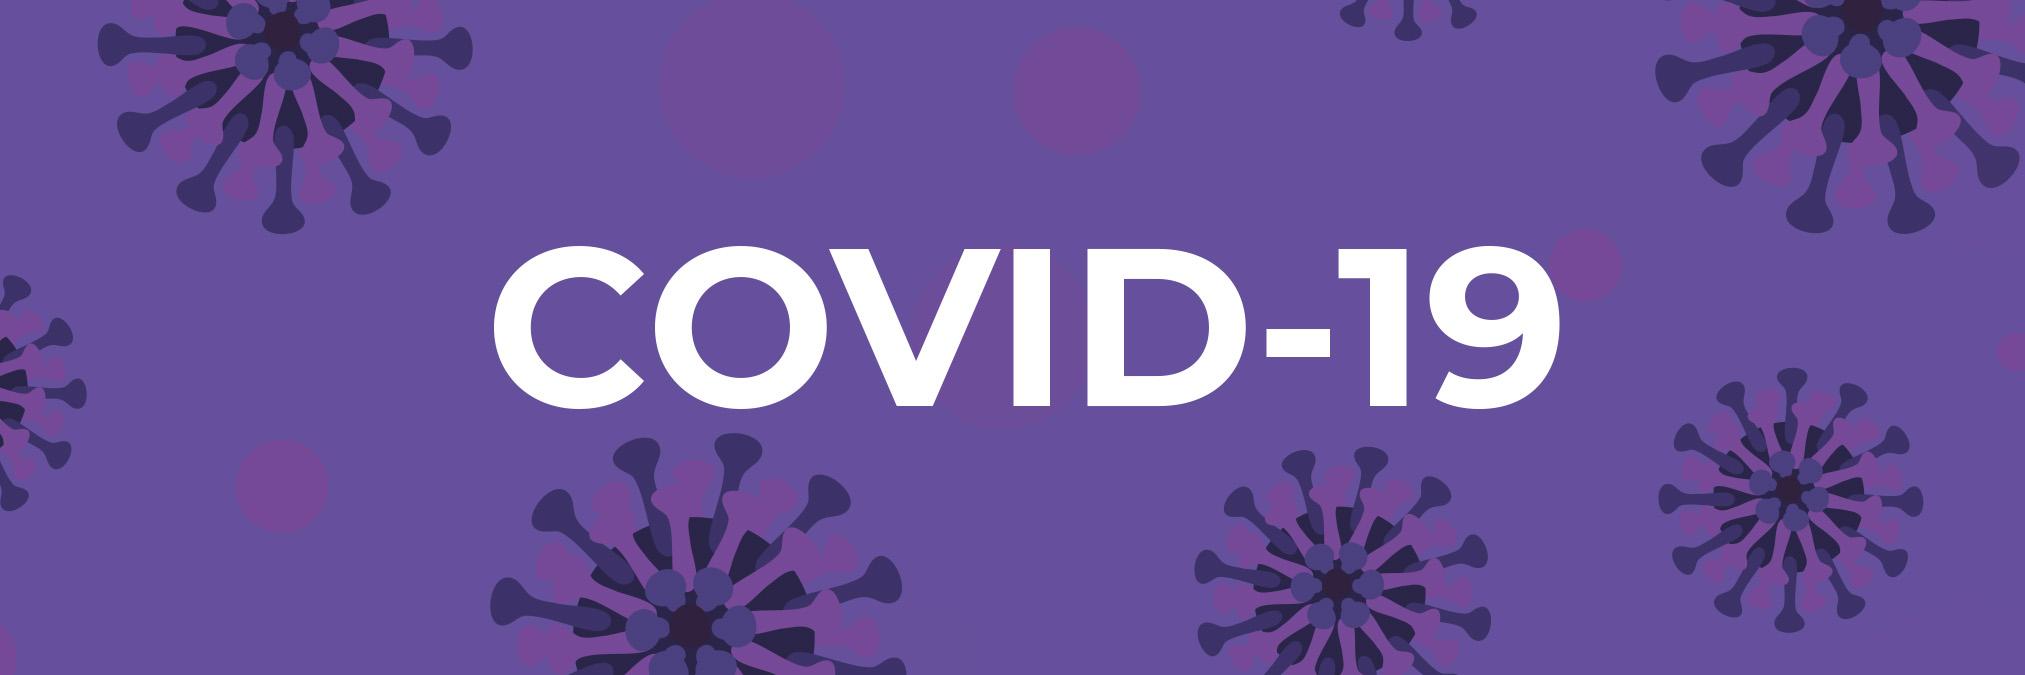 Coronavirus (COVID-19) for employers and employees